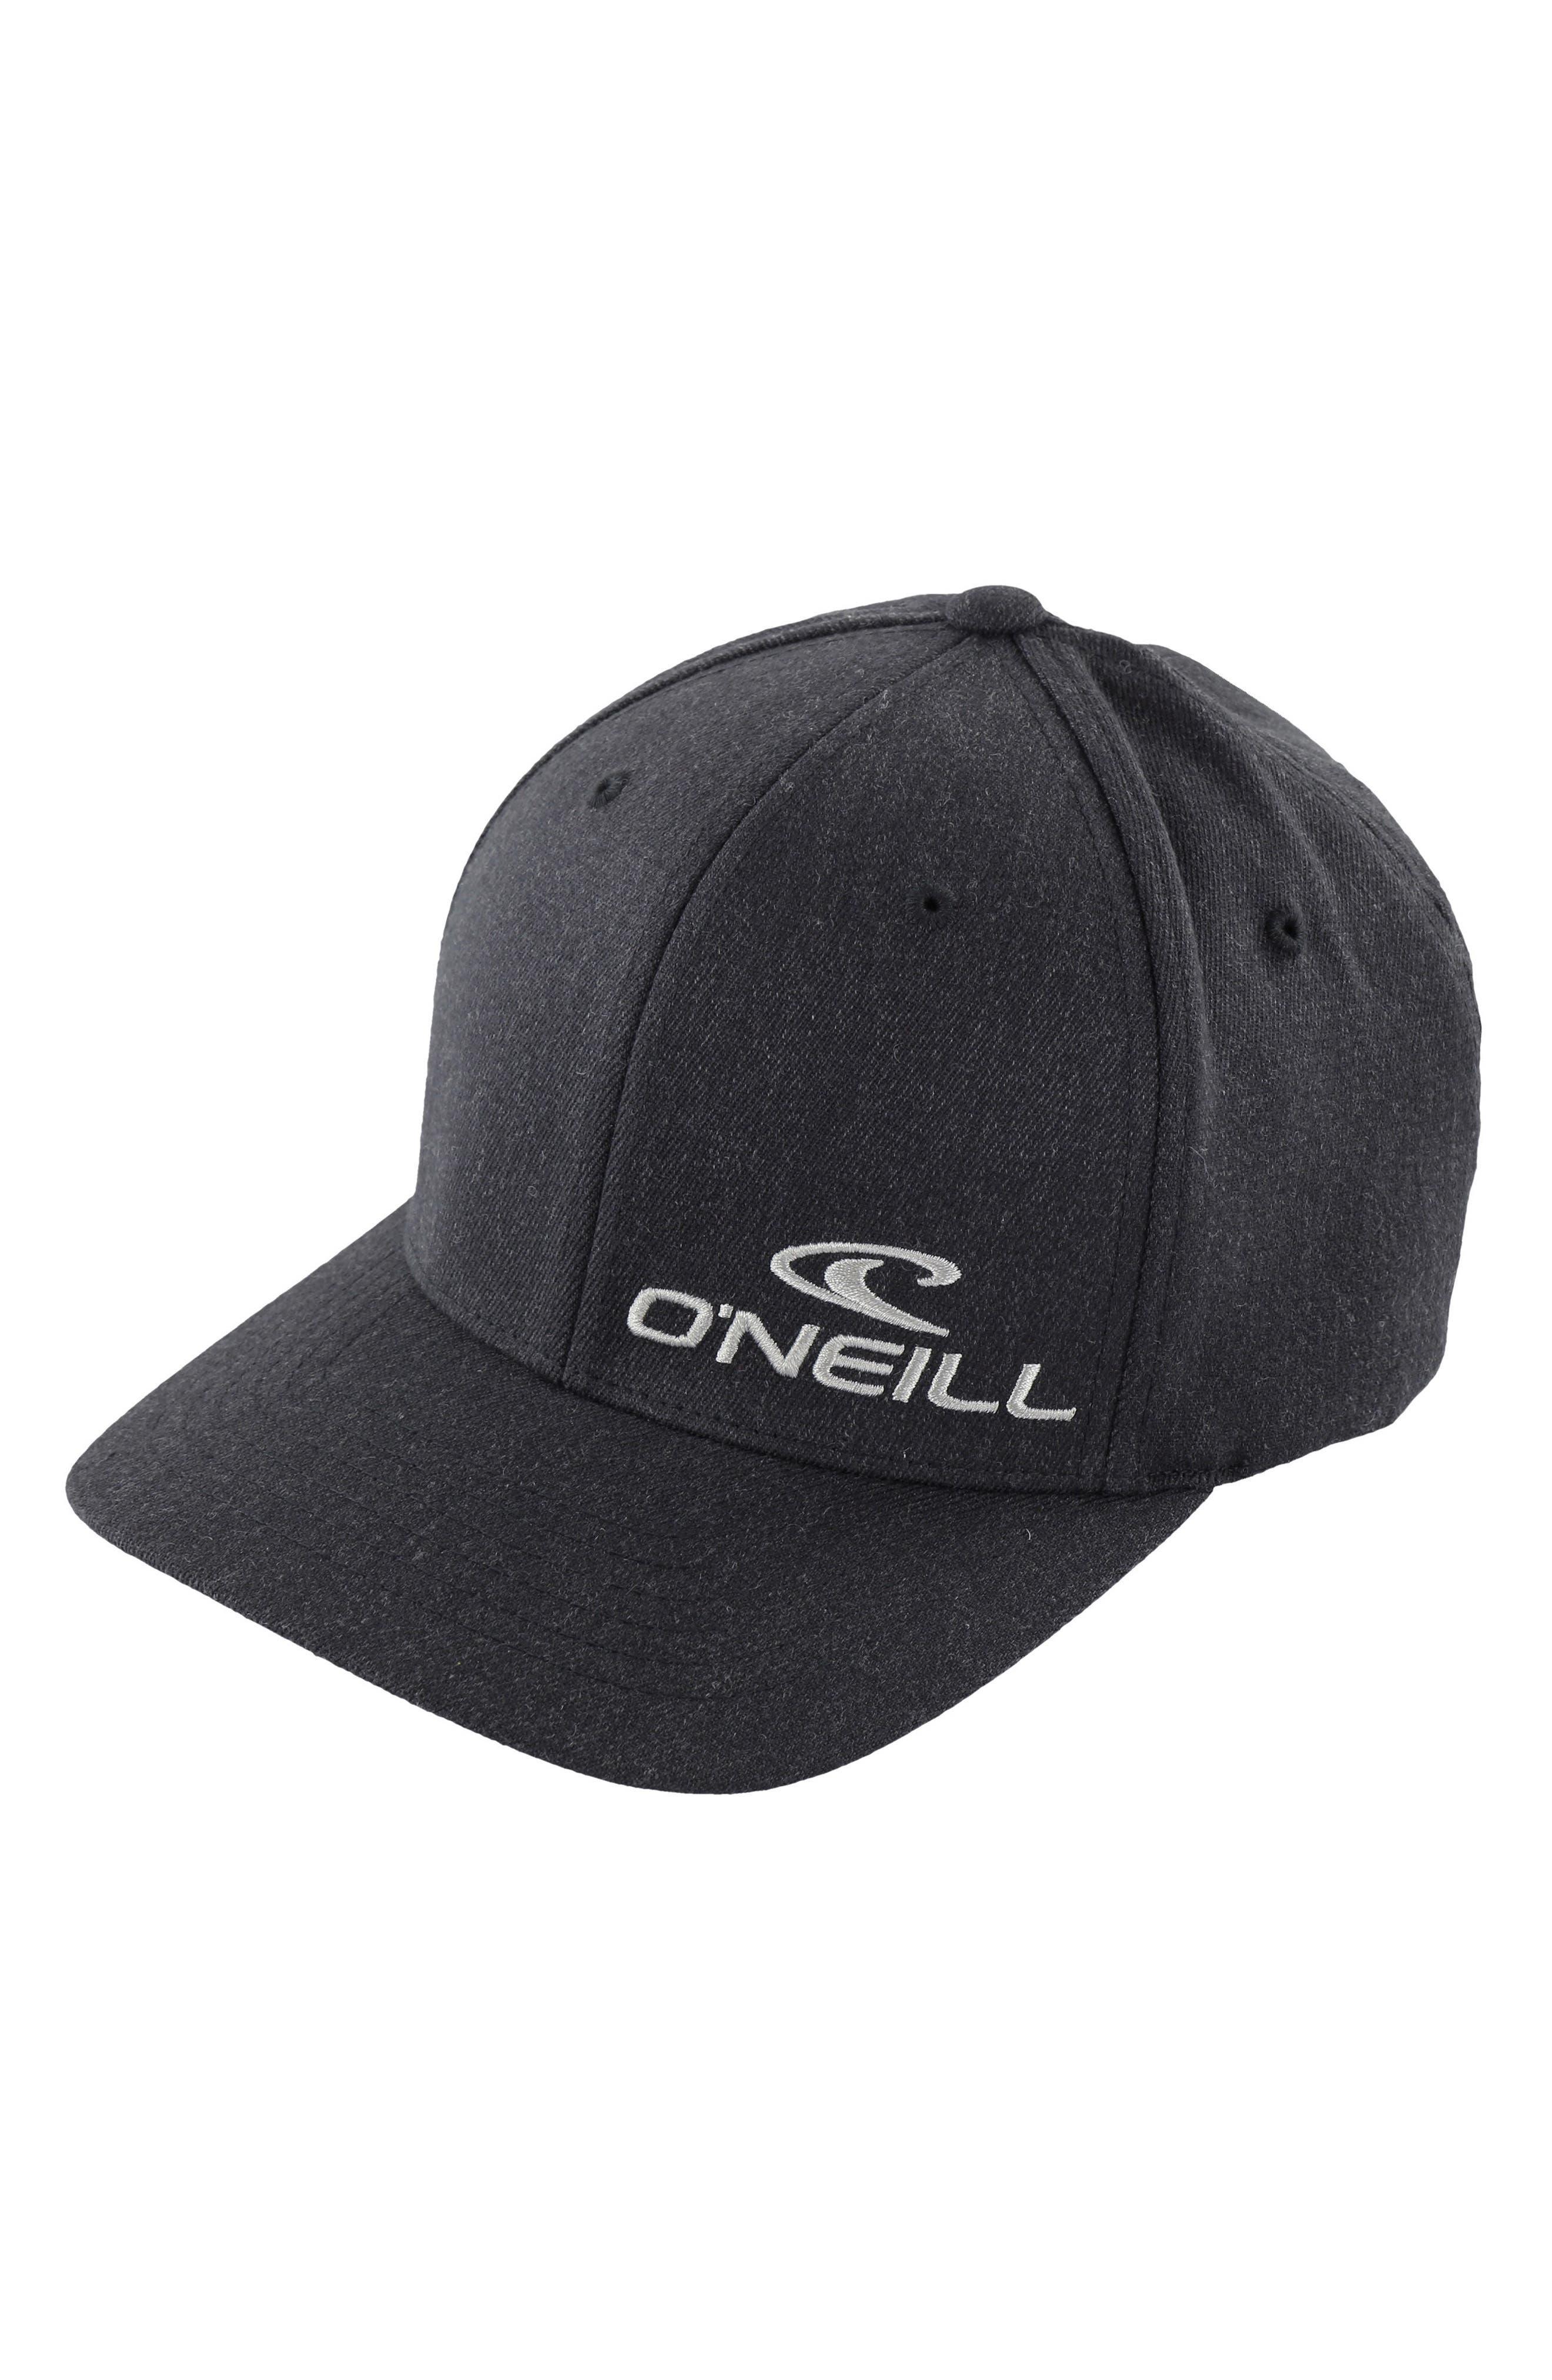 Lodown Ball Cap,                         Main,                         color, Charcoal